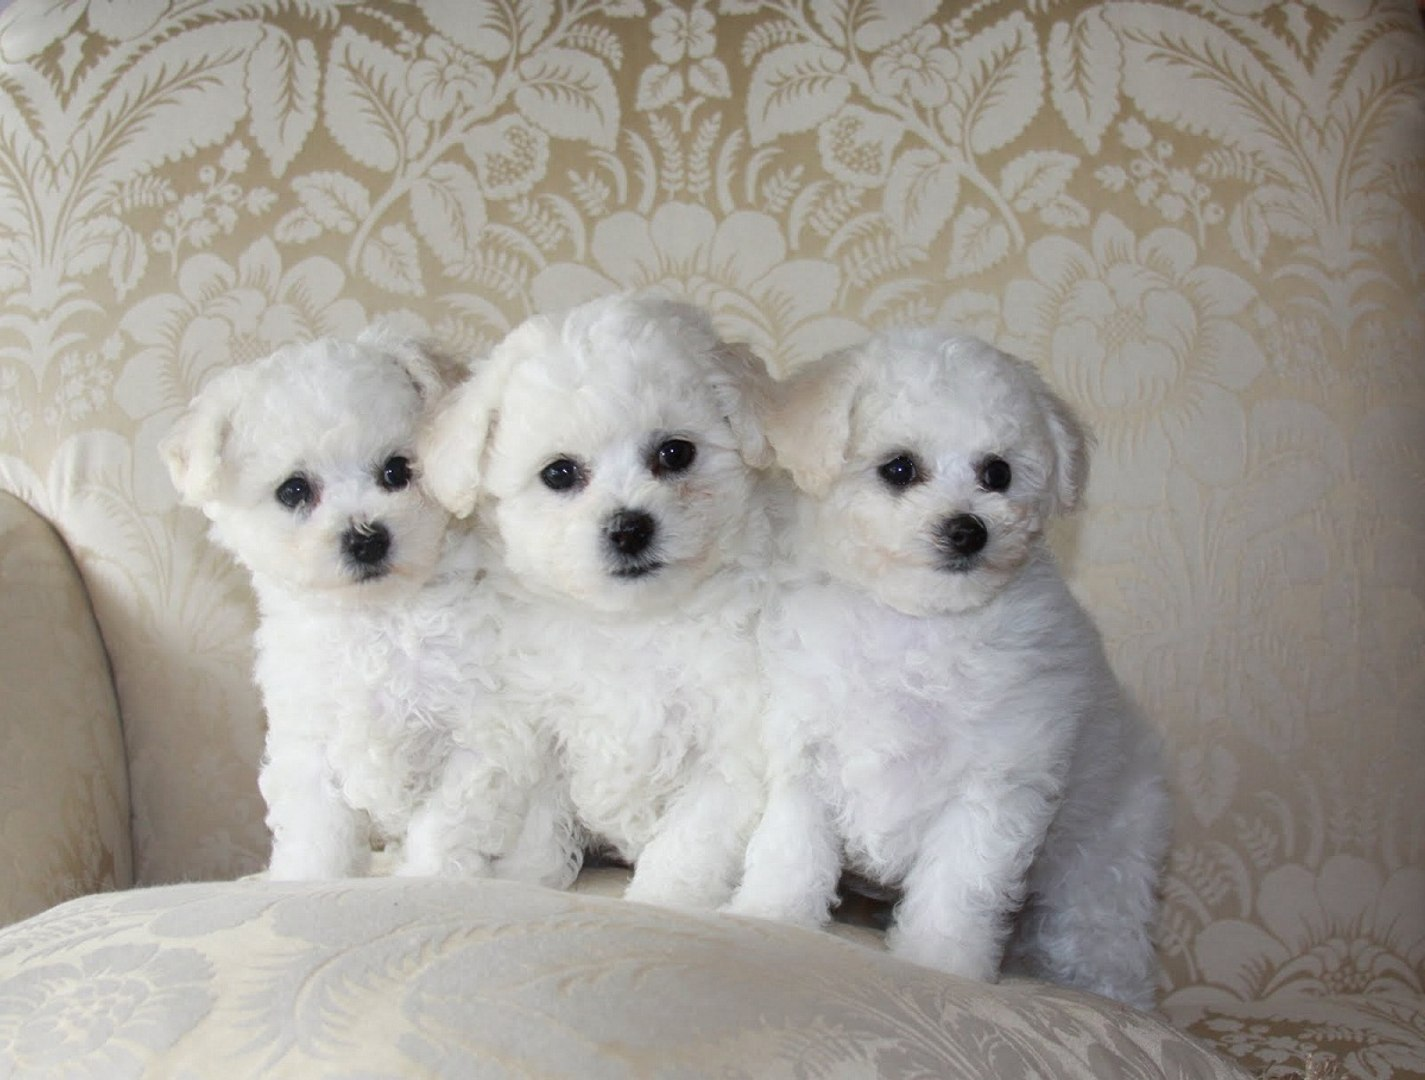 Bichon Frise Poodle Puppies 85 Doggyman